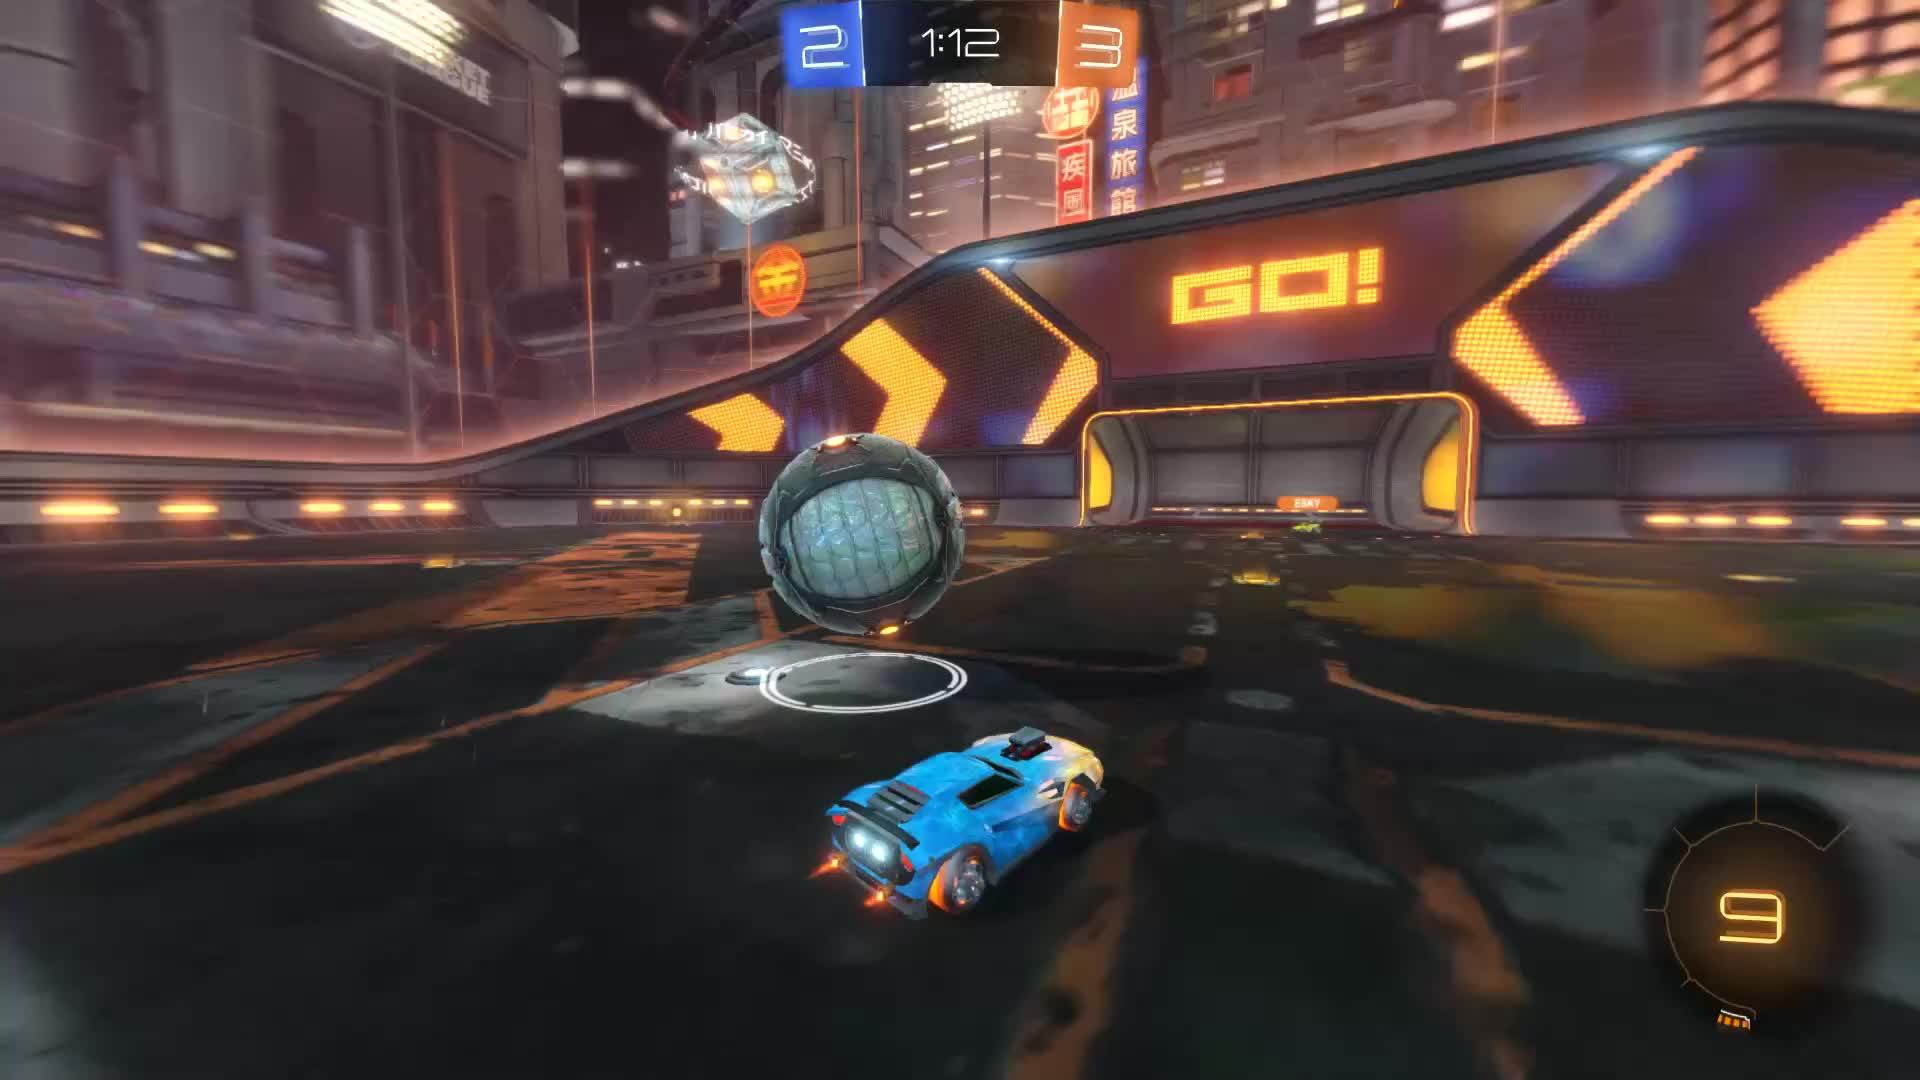 Gif Your Game, GifYourGame, Goal, Rocket League, RocketLeague, Zary, Goal 6: Zary GIFs